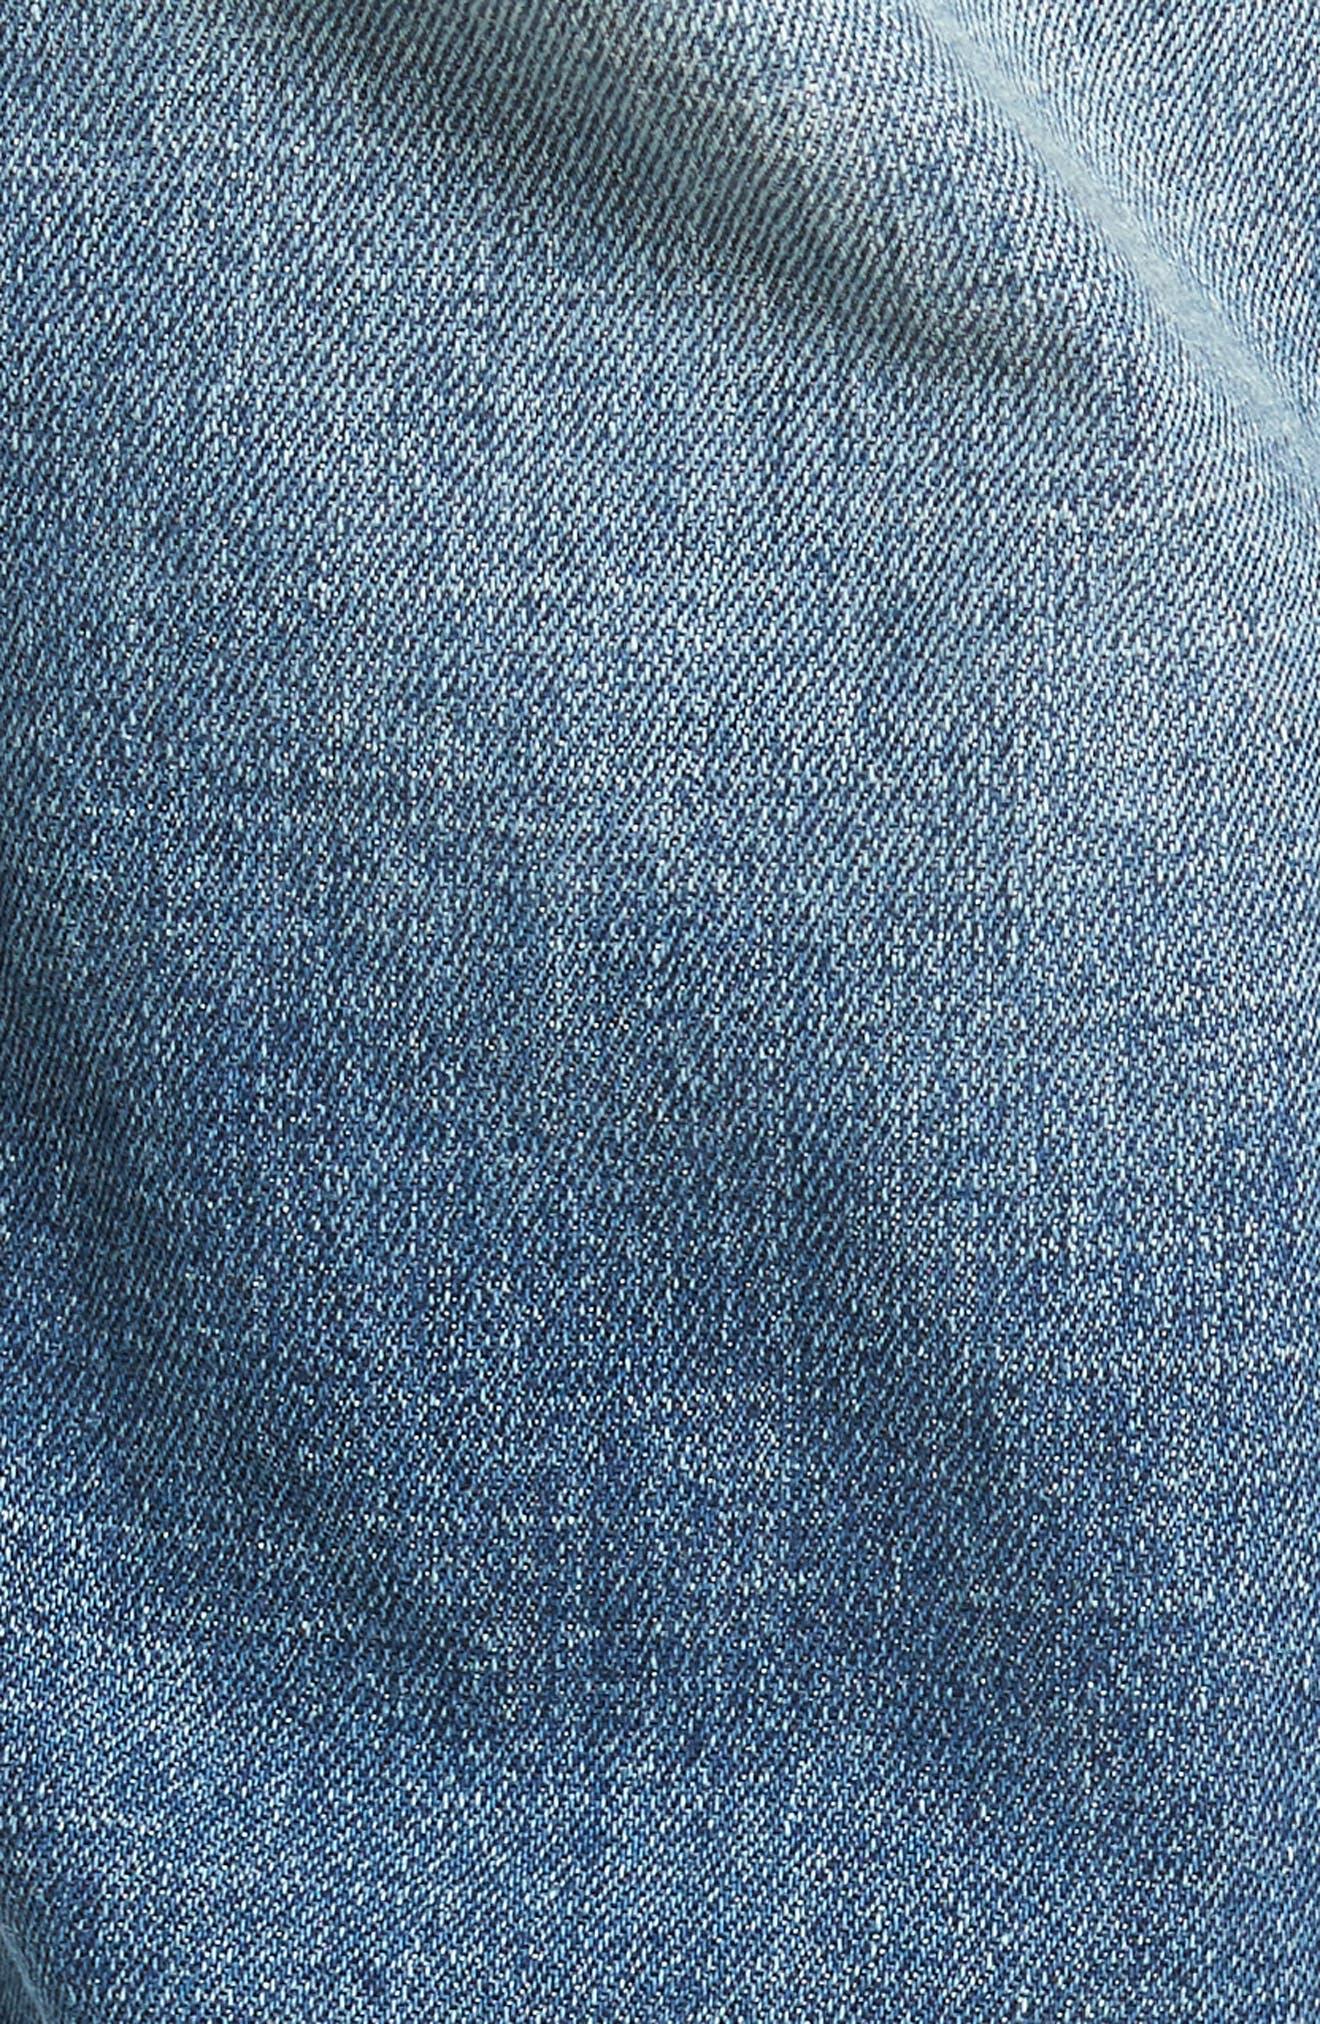 Slim Fit Side Stripe Jeans,                             Alternate thumbnail 5, color,                             BLUE STALEY WASH